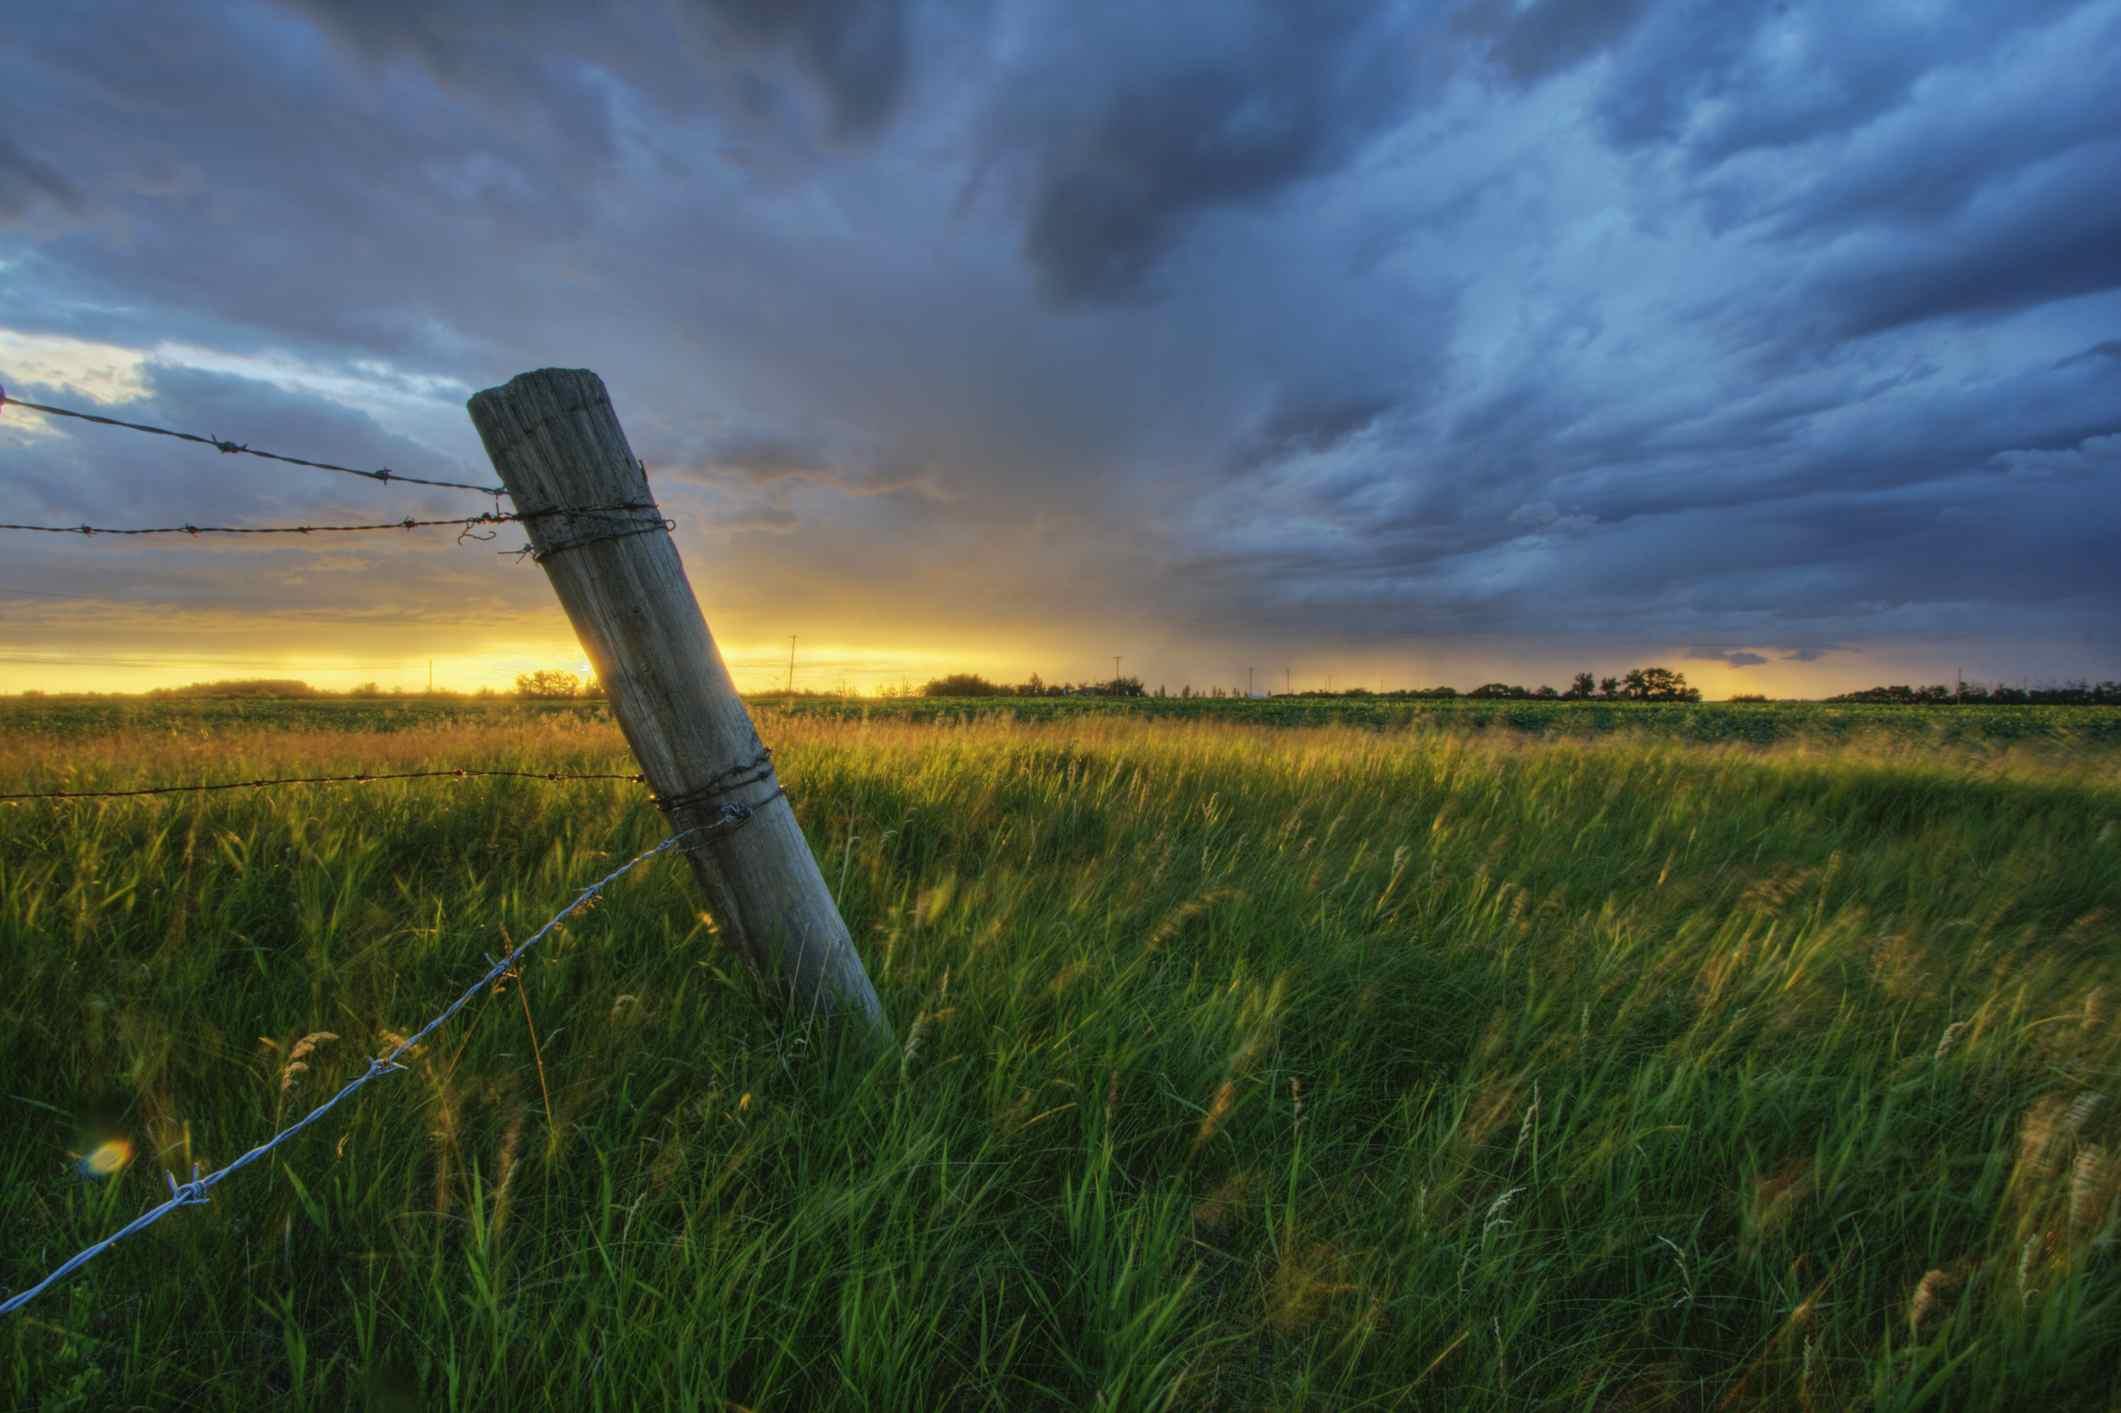 Summer thunderstorm and fencepost on a wheat farm north of Edmonton, Alberta